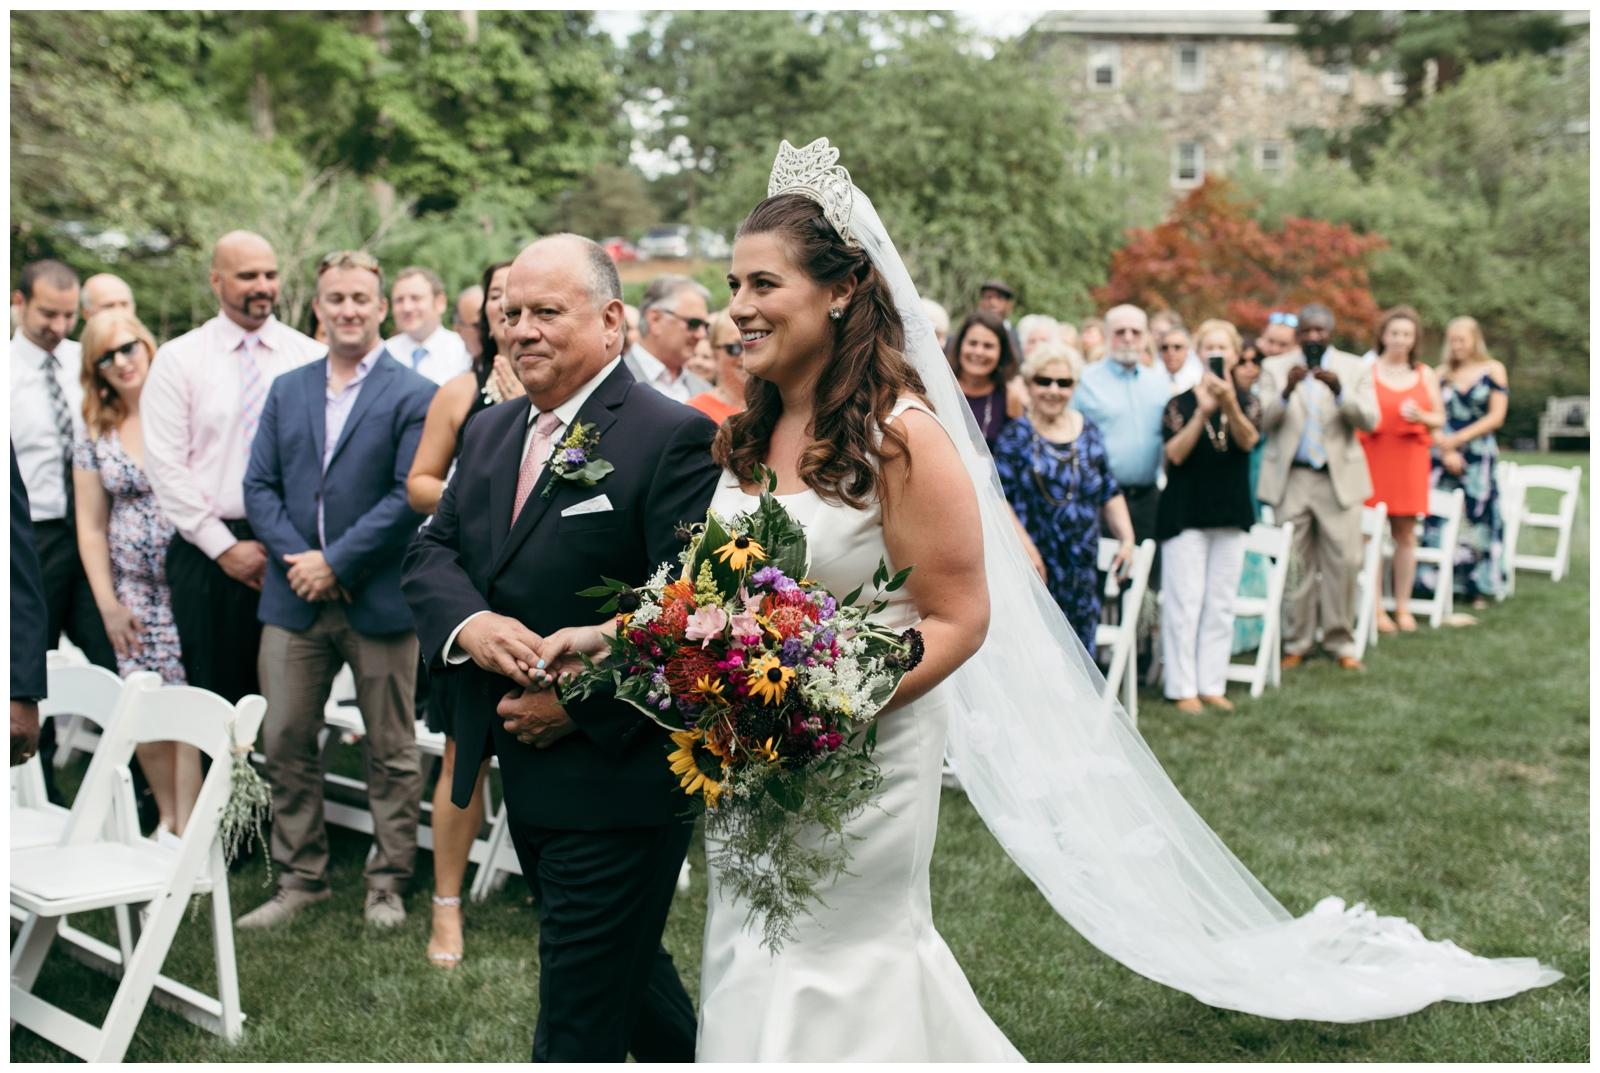 Bailey-Q-Photo-Connors-Center-Wedding-Boston-Wedding-Photographer-043.jpg